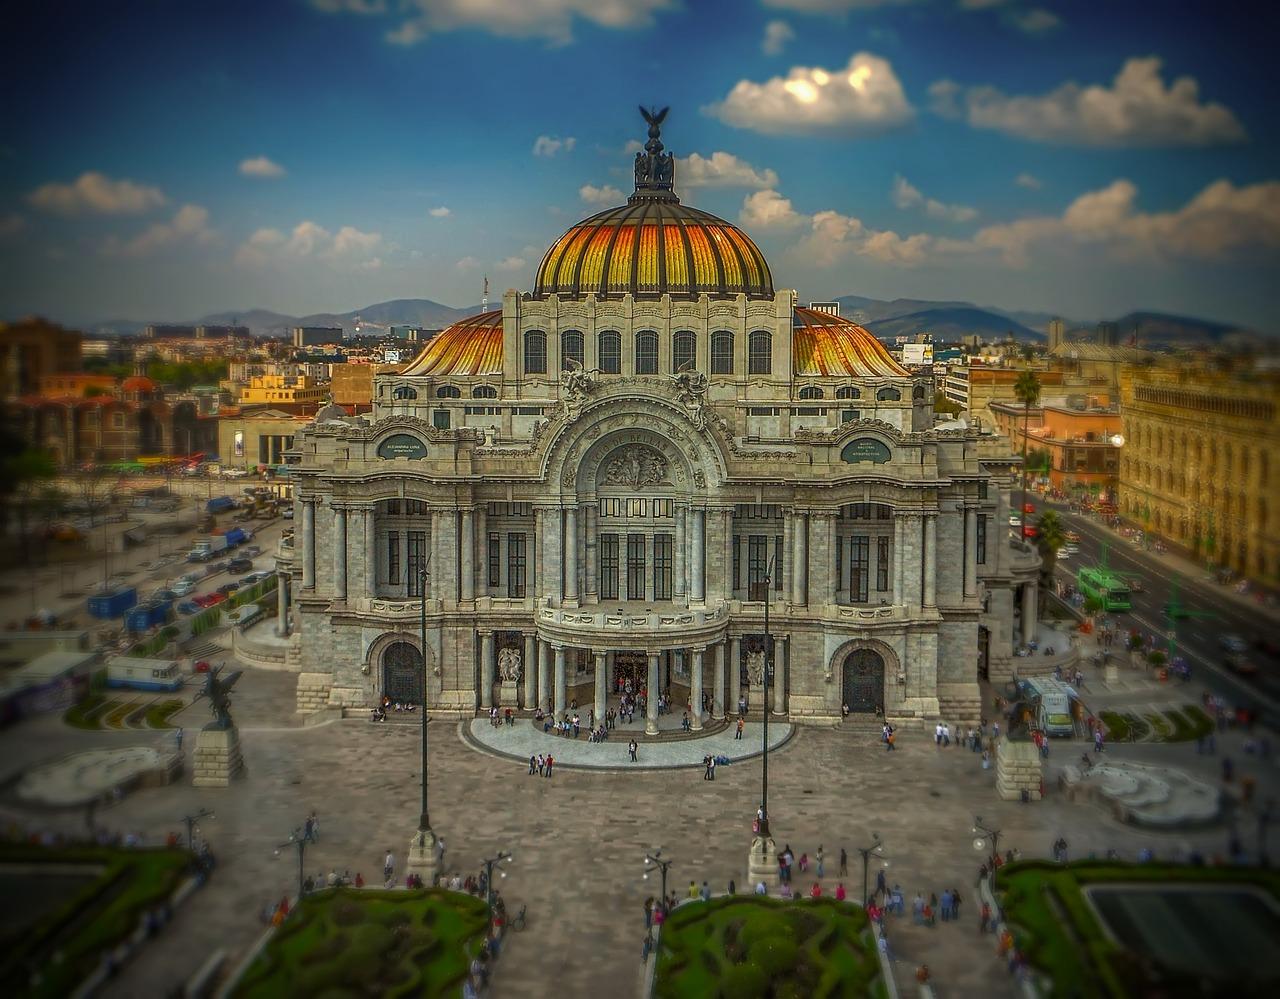 Travel Contests March 29 2017 Mexico City Tokyo California More